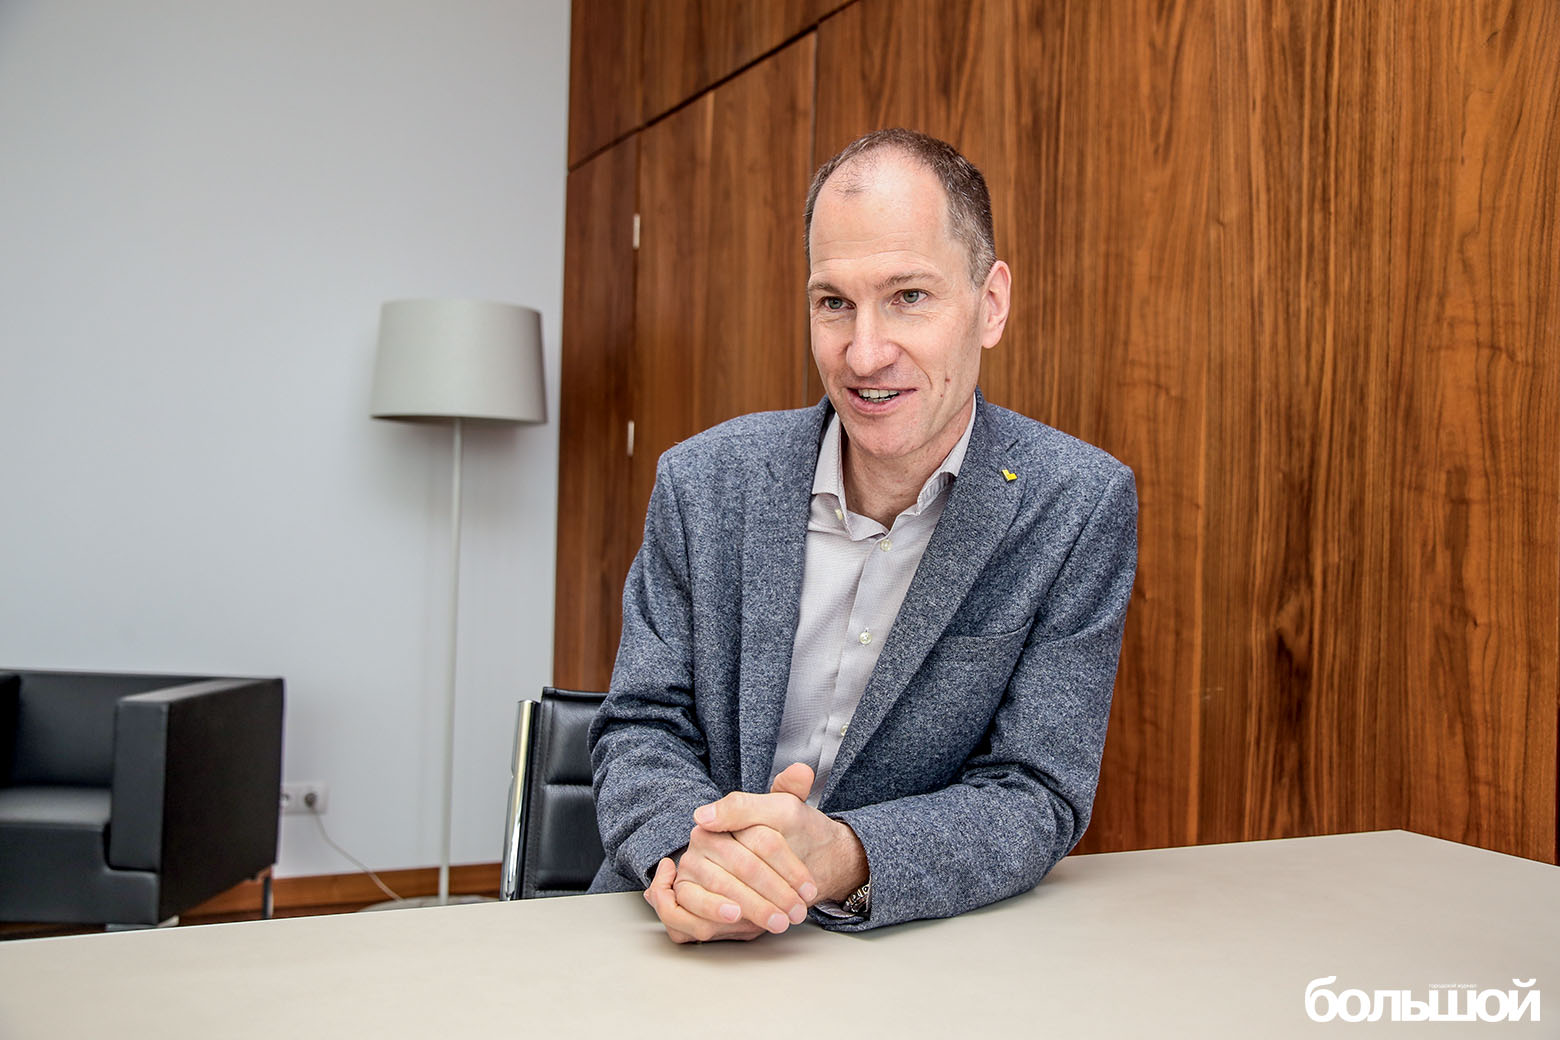 Кристиан Лаке, компаниия velcom